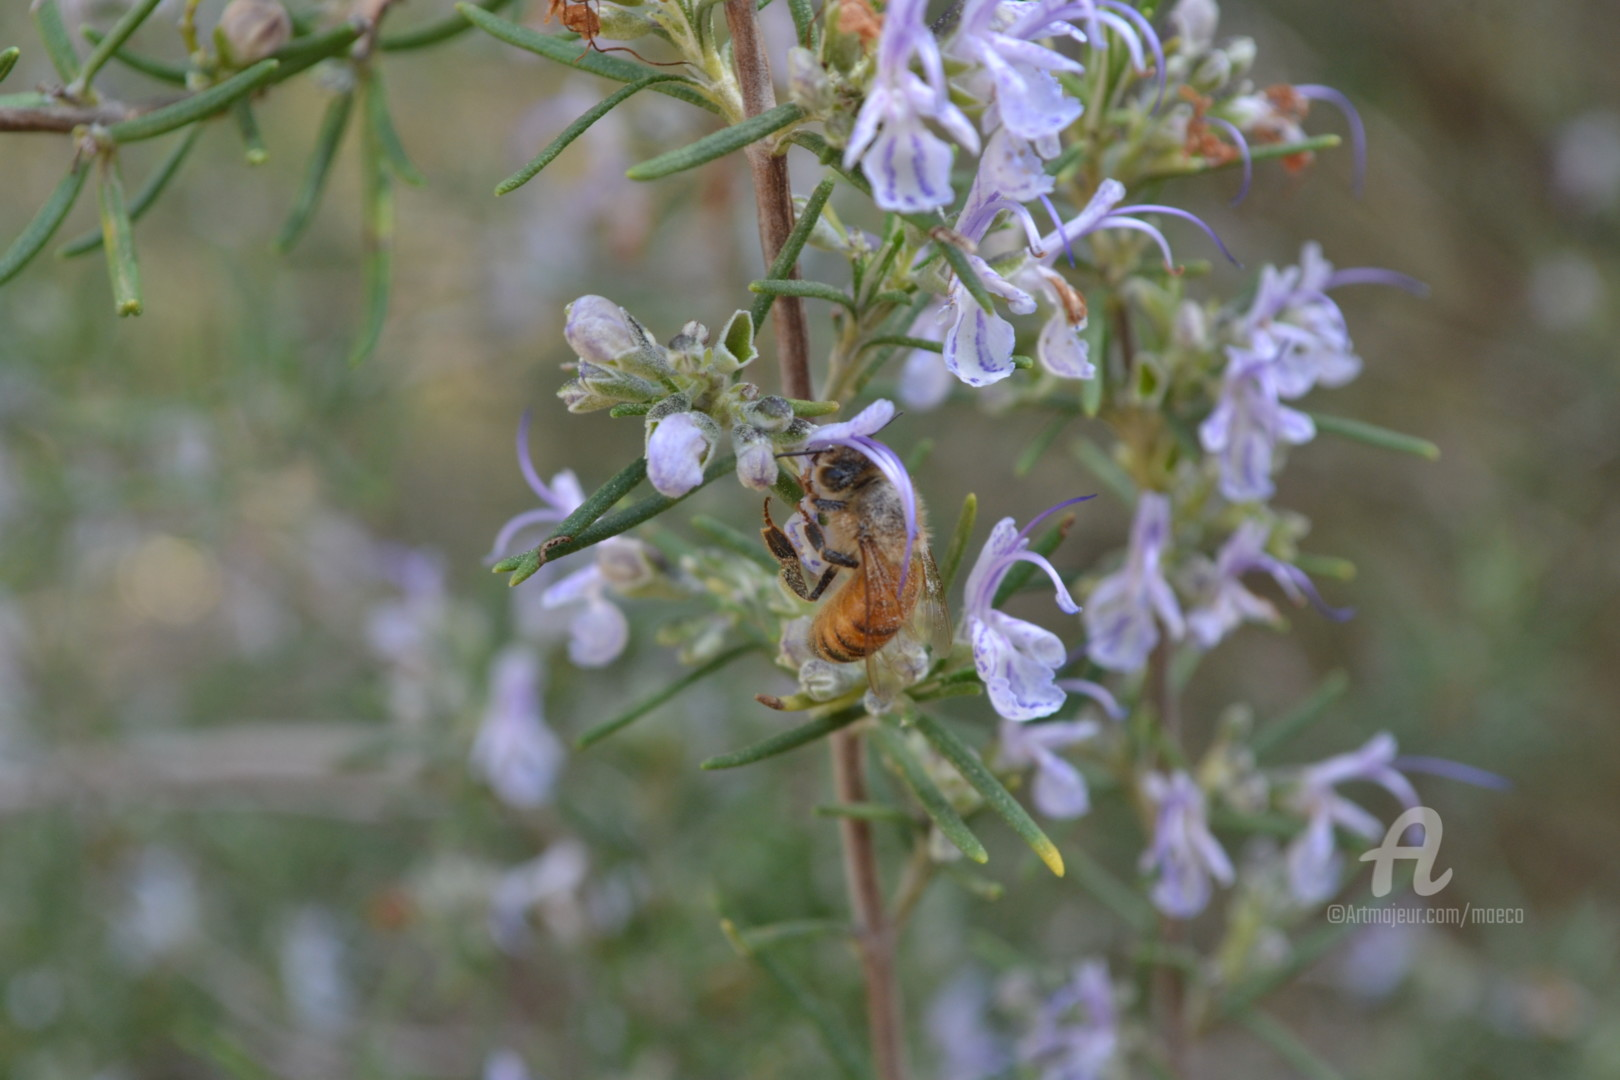 Mariska Ma Veepilaikaliyamma - Fleur et abeille Flower and bee